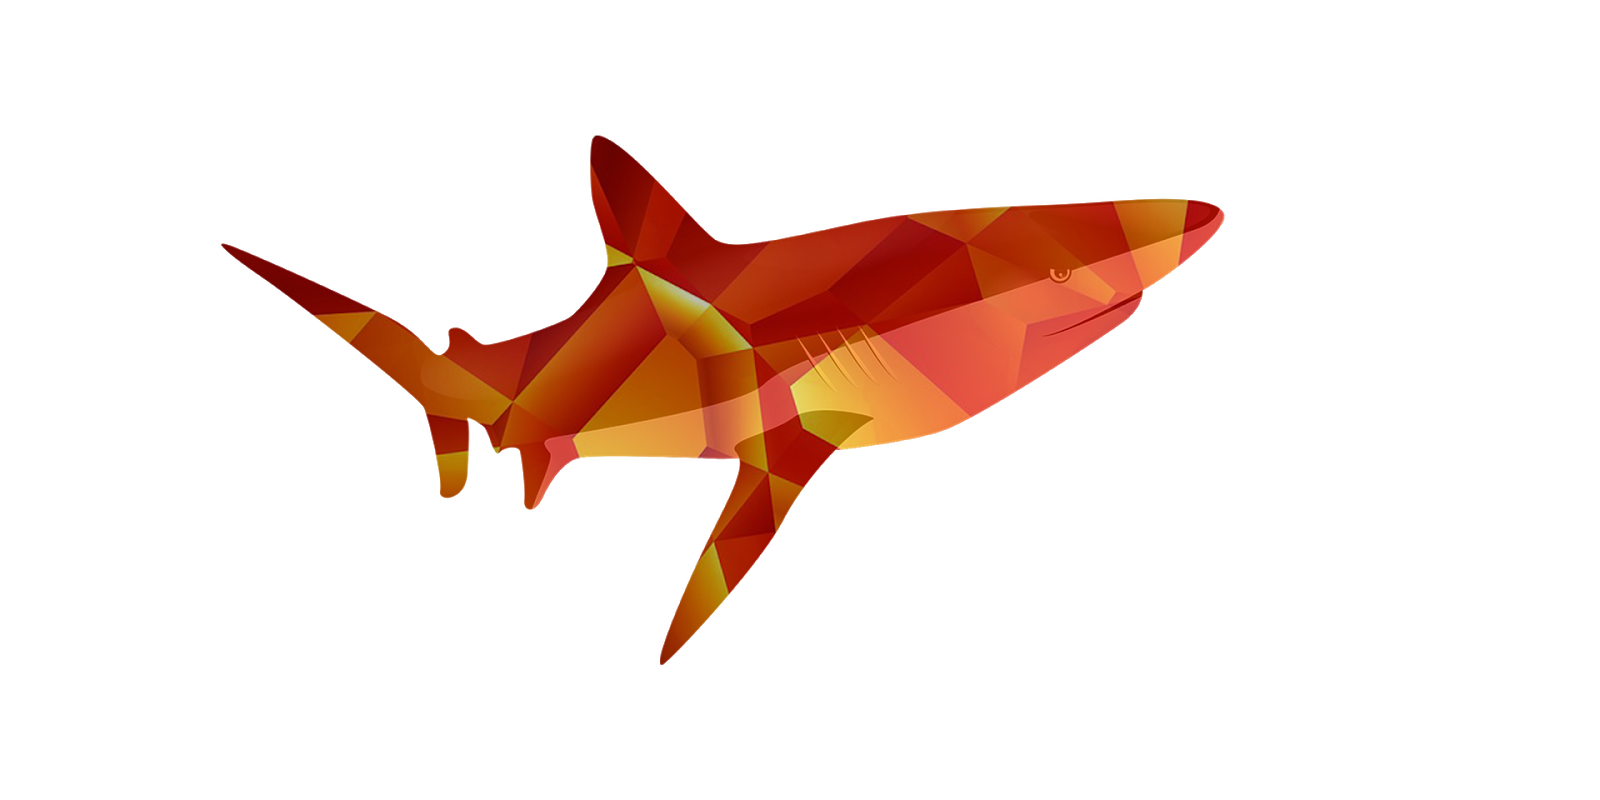 fish images drawing